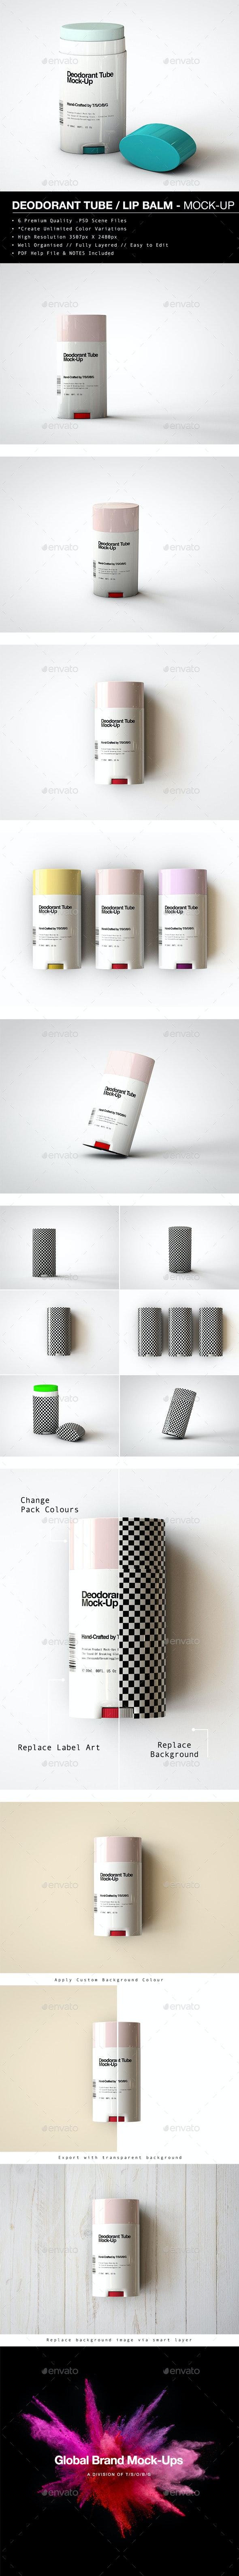 Deodorant Stick | Oval Lip Balm Tube Mock-Up - Beauty Packaging